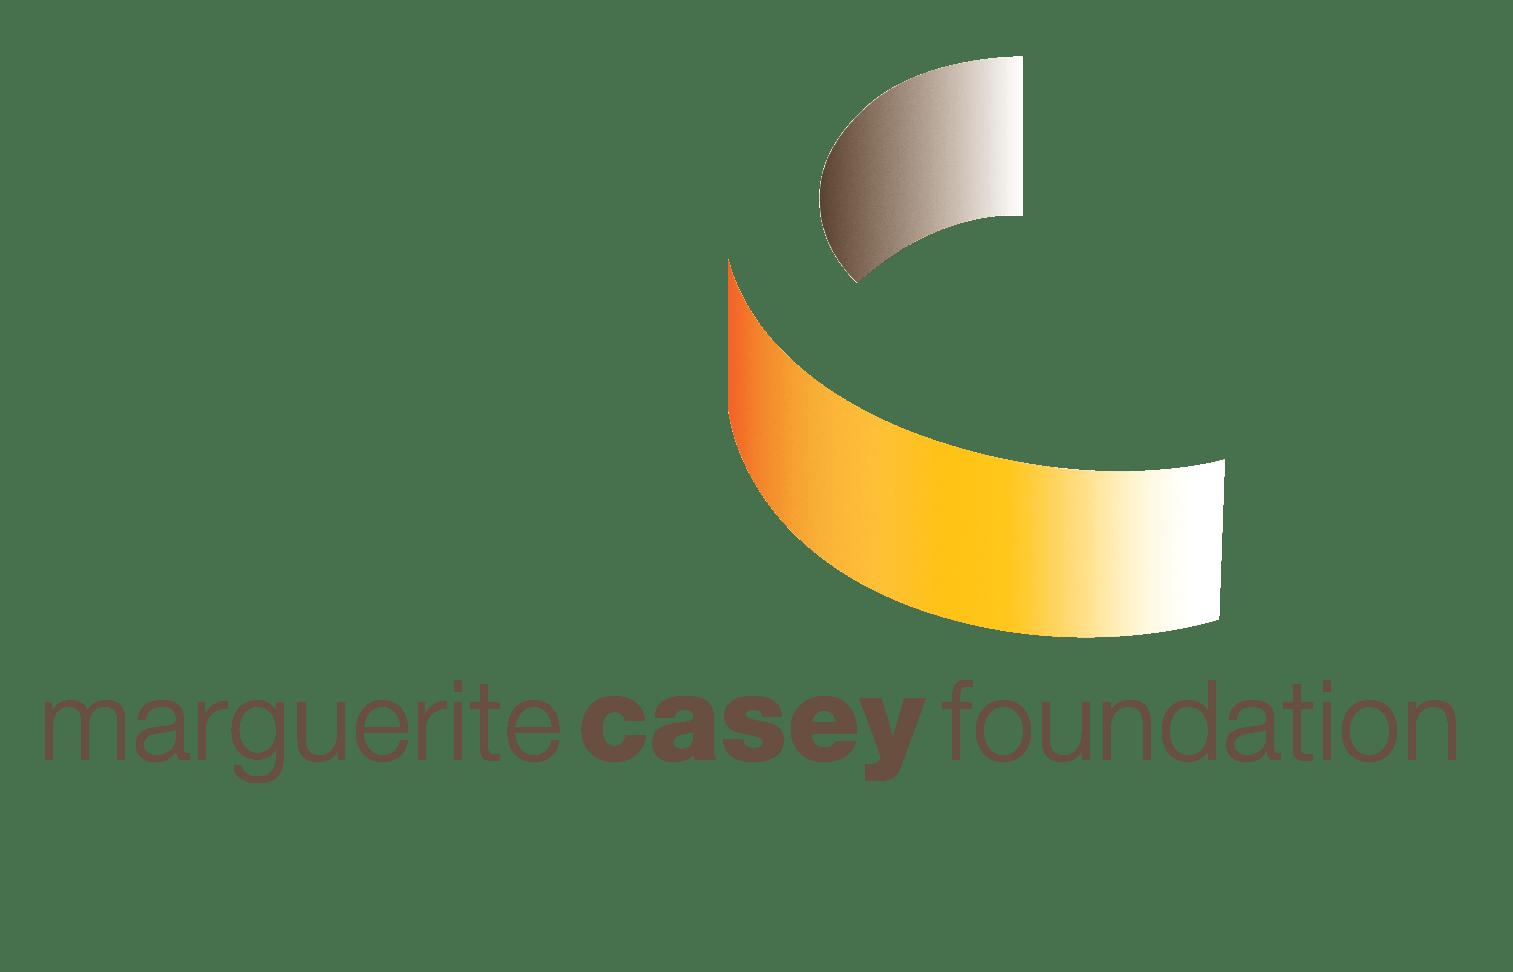 Marguerite_Casey_Foundation.png